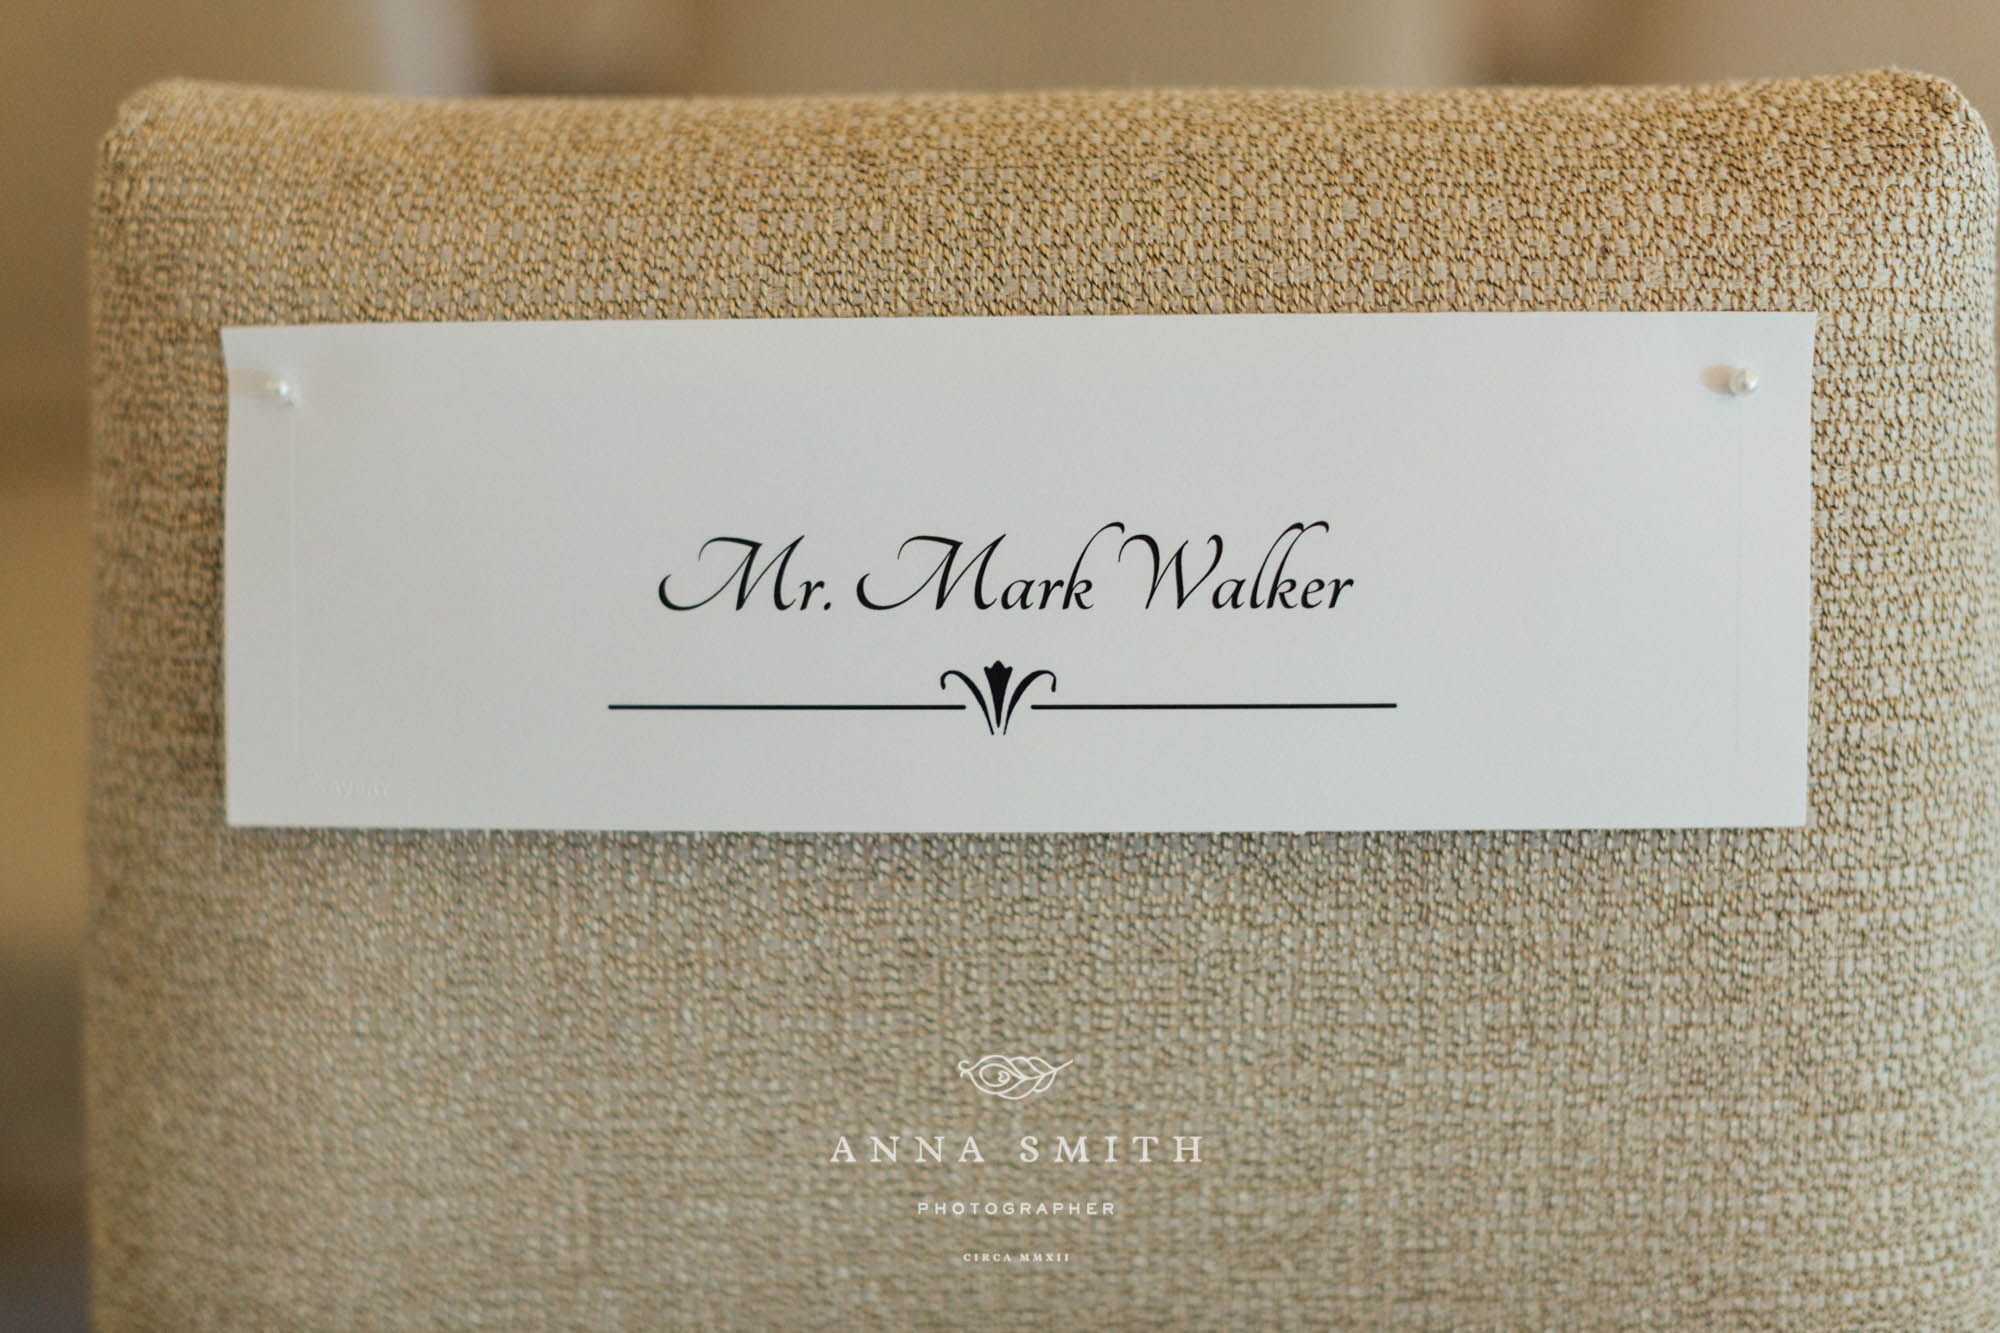 WEB 2016-6-W-CD-courtney brett the mansion on turtle creek wedding anna smith photography  (9 of 879).jpg